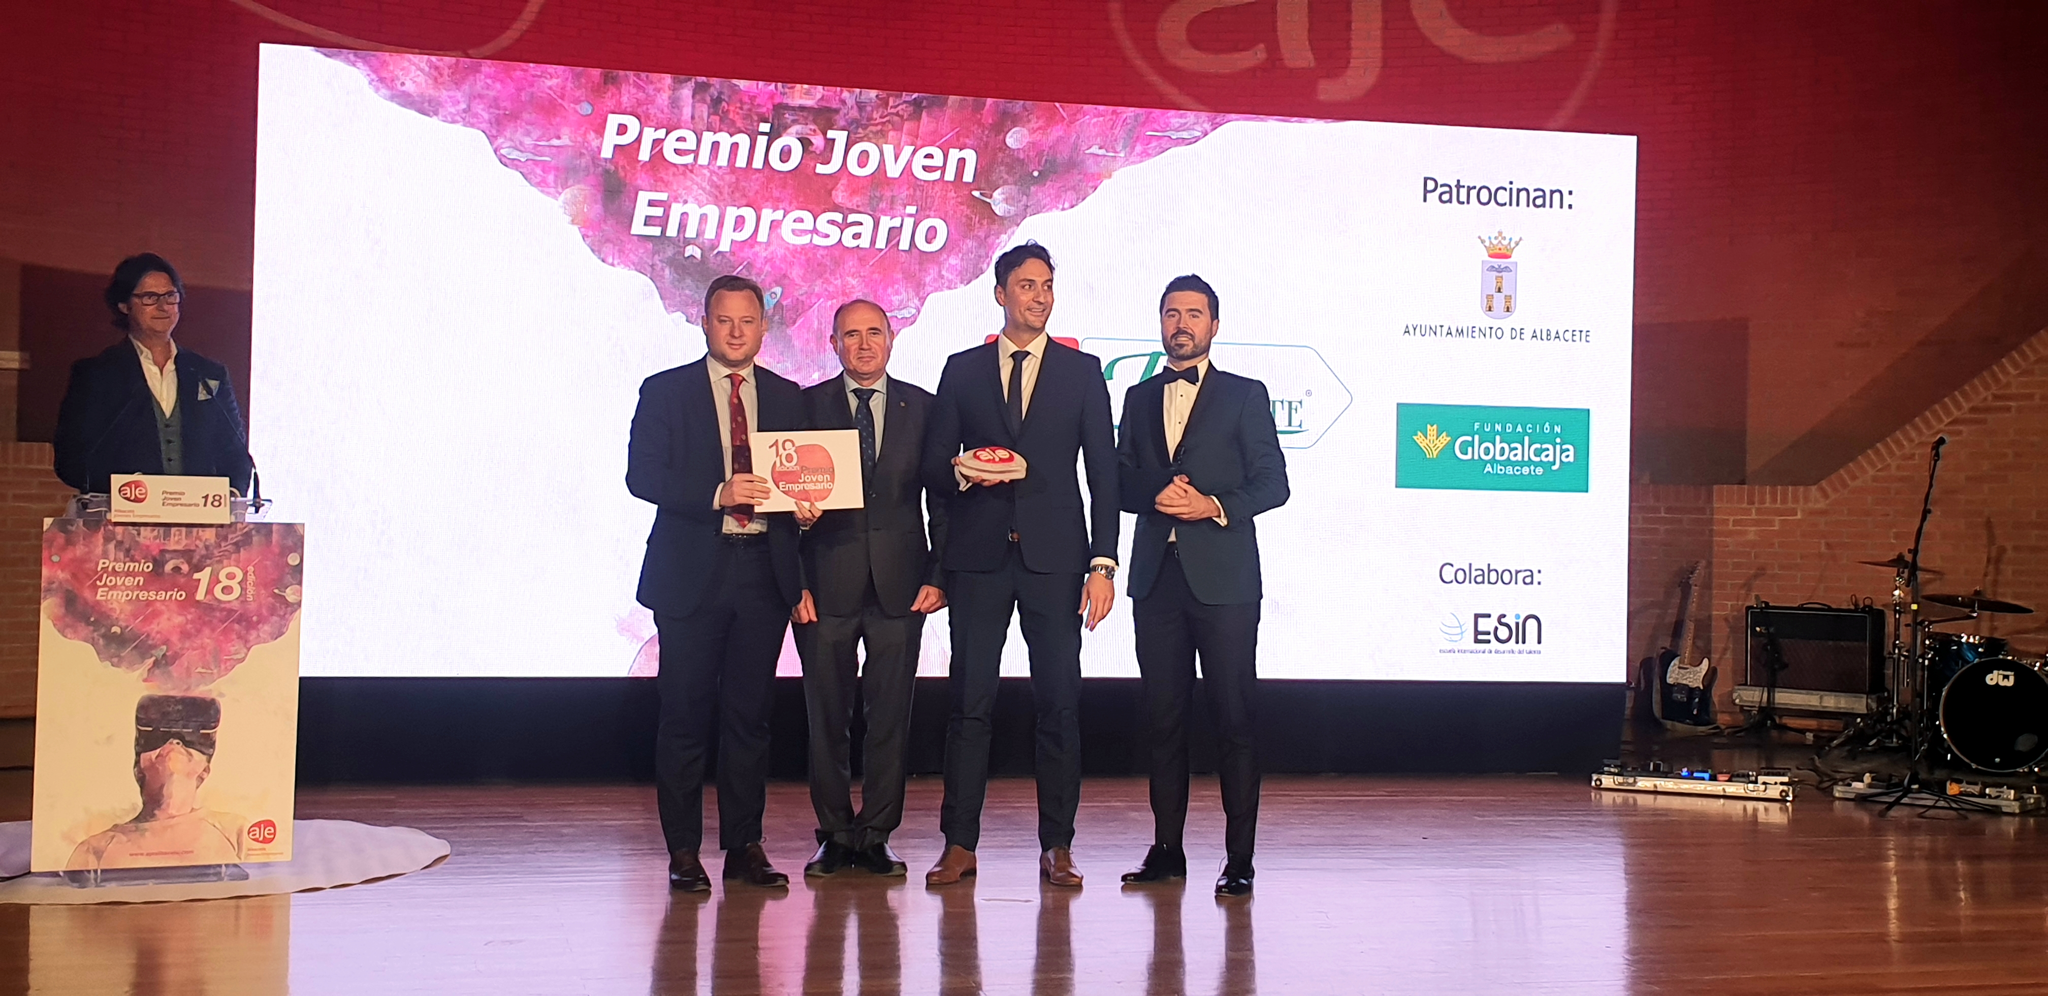 https://blog.globalcaja.es/wp-content/uploads/2019/10/Globalcaja-premios-AJE.jpg